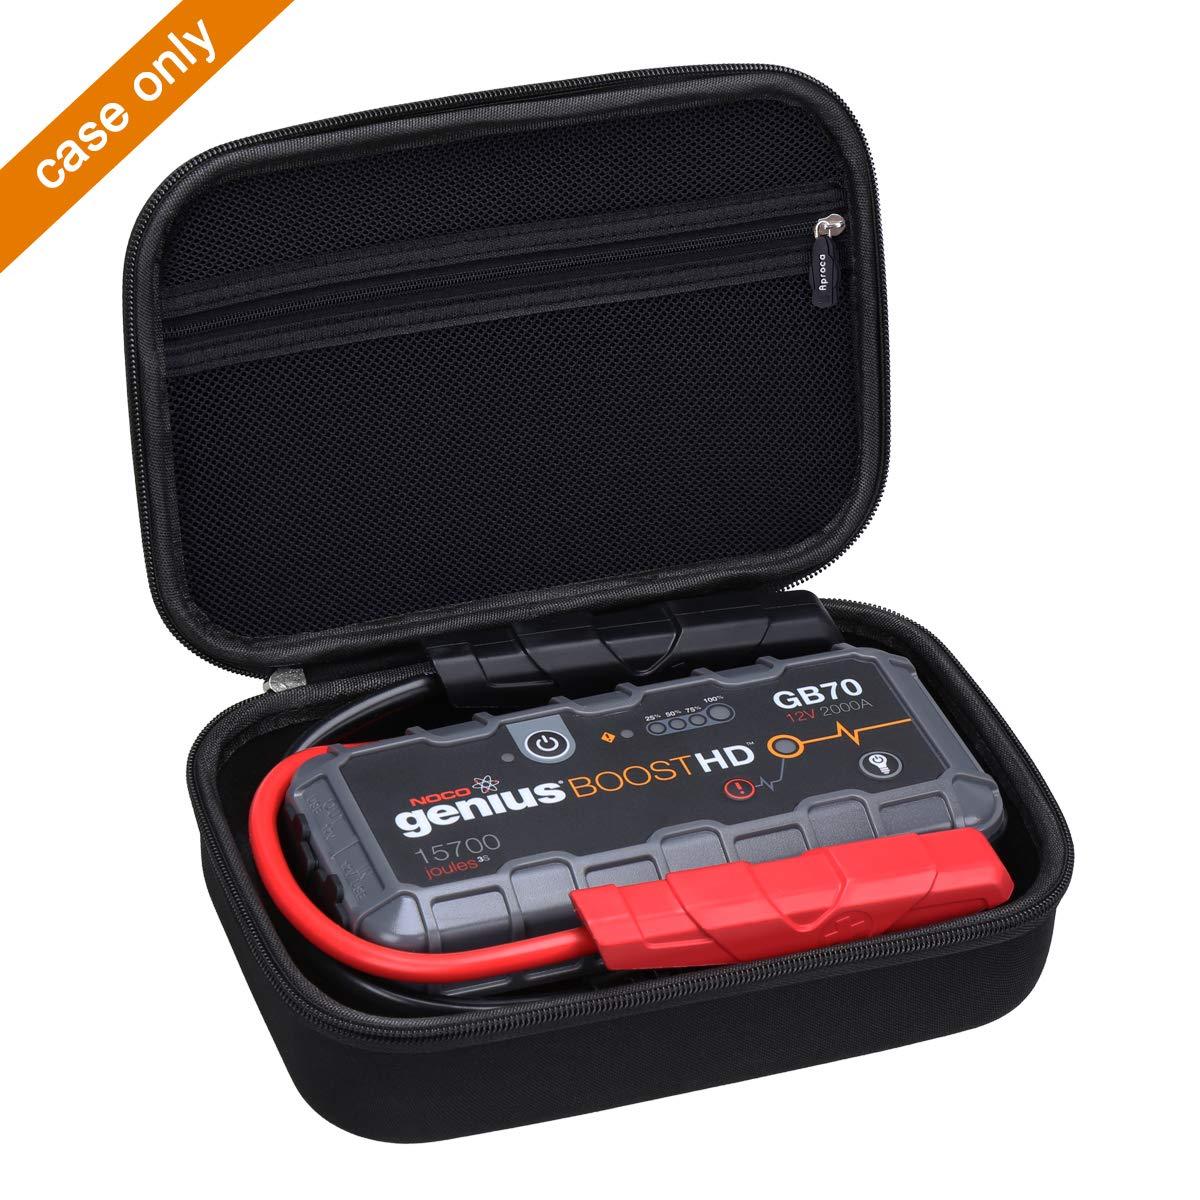 Aproca Hard Protective Case Compatible NOCO Genius Boost HD GB70 2000 Amp 12V UltraSafe Lithium Jump Starter Black-New